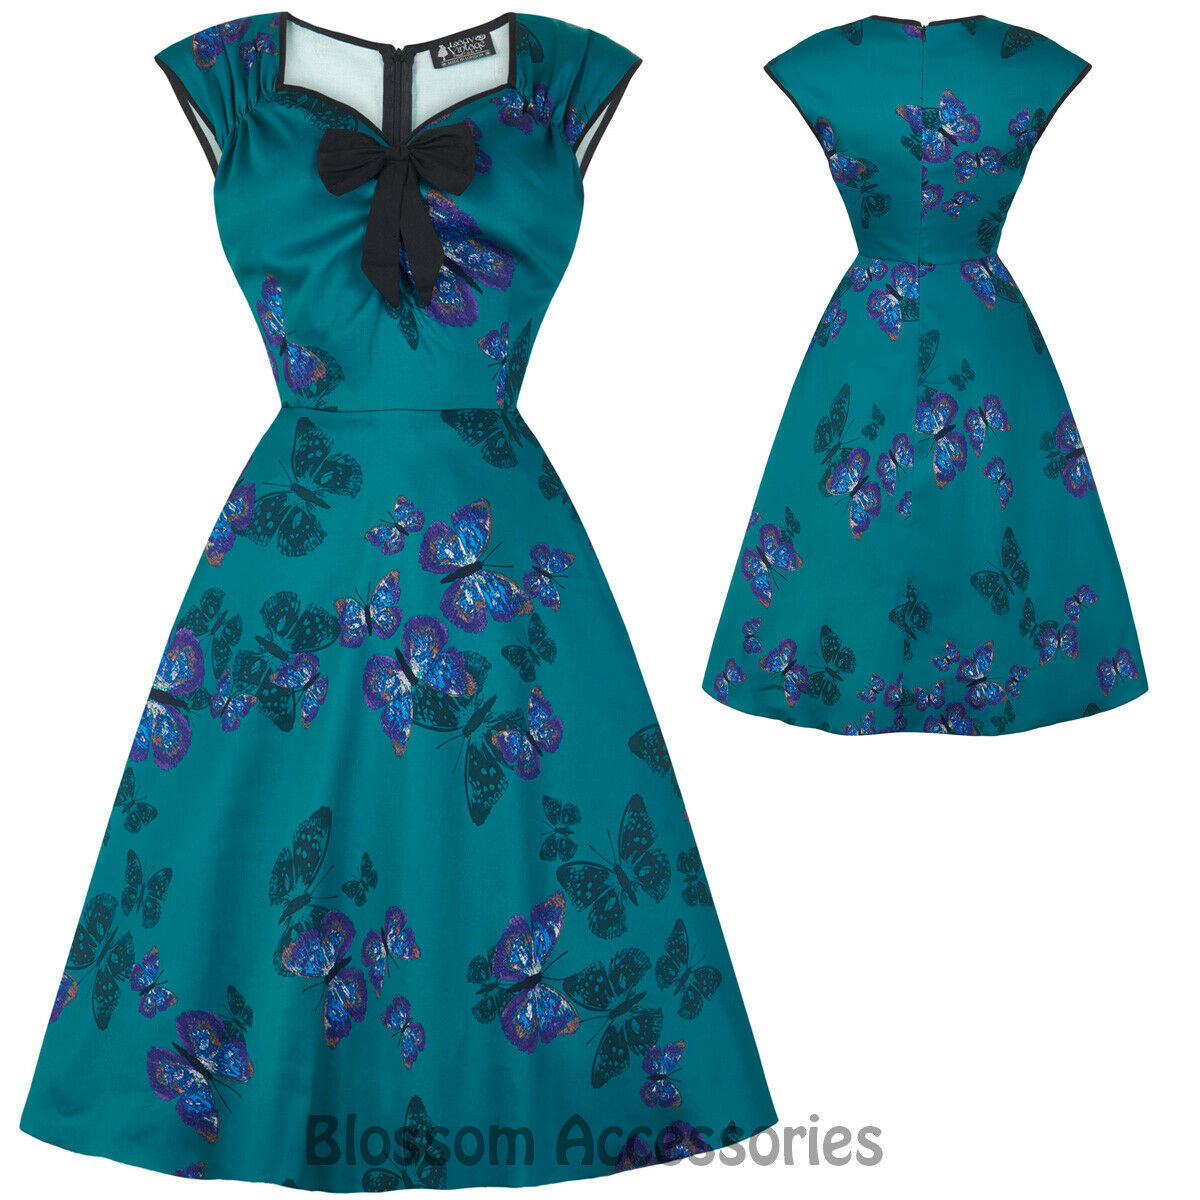 RKL34 Lady Vintage Isabella Teal Butterfly 50 Swing Retro Rockabilly Party Dress